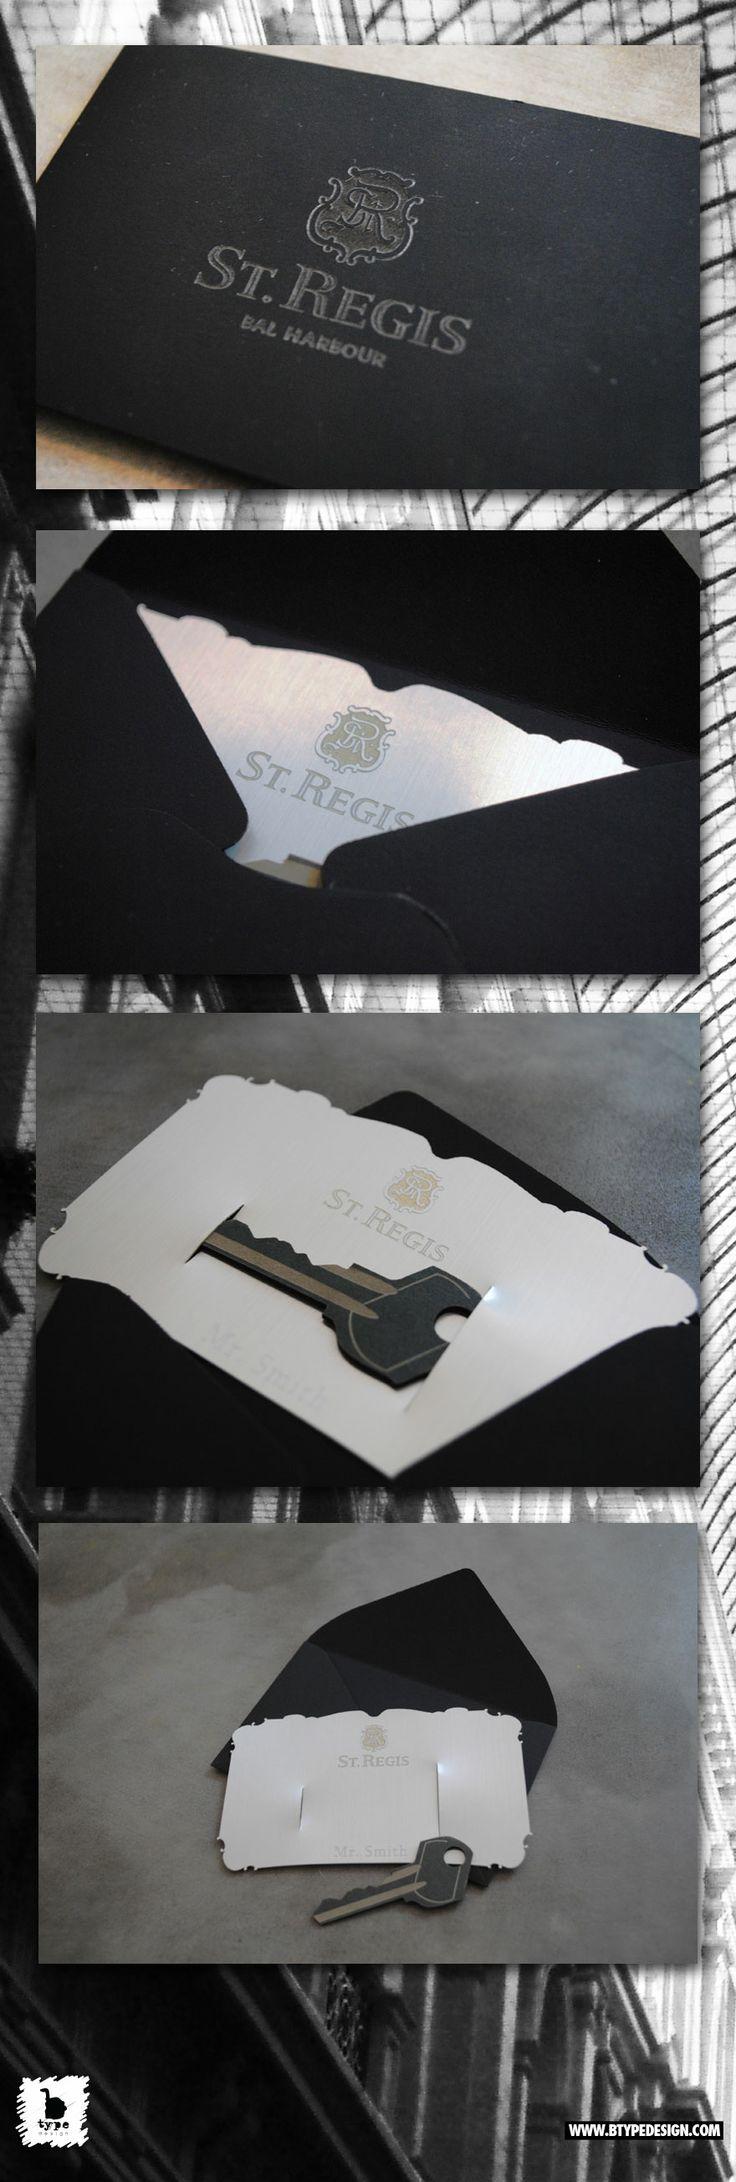 Invitation event / key envelope